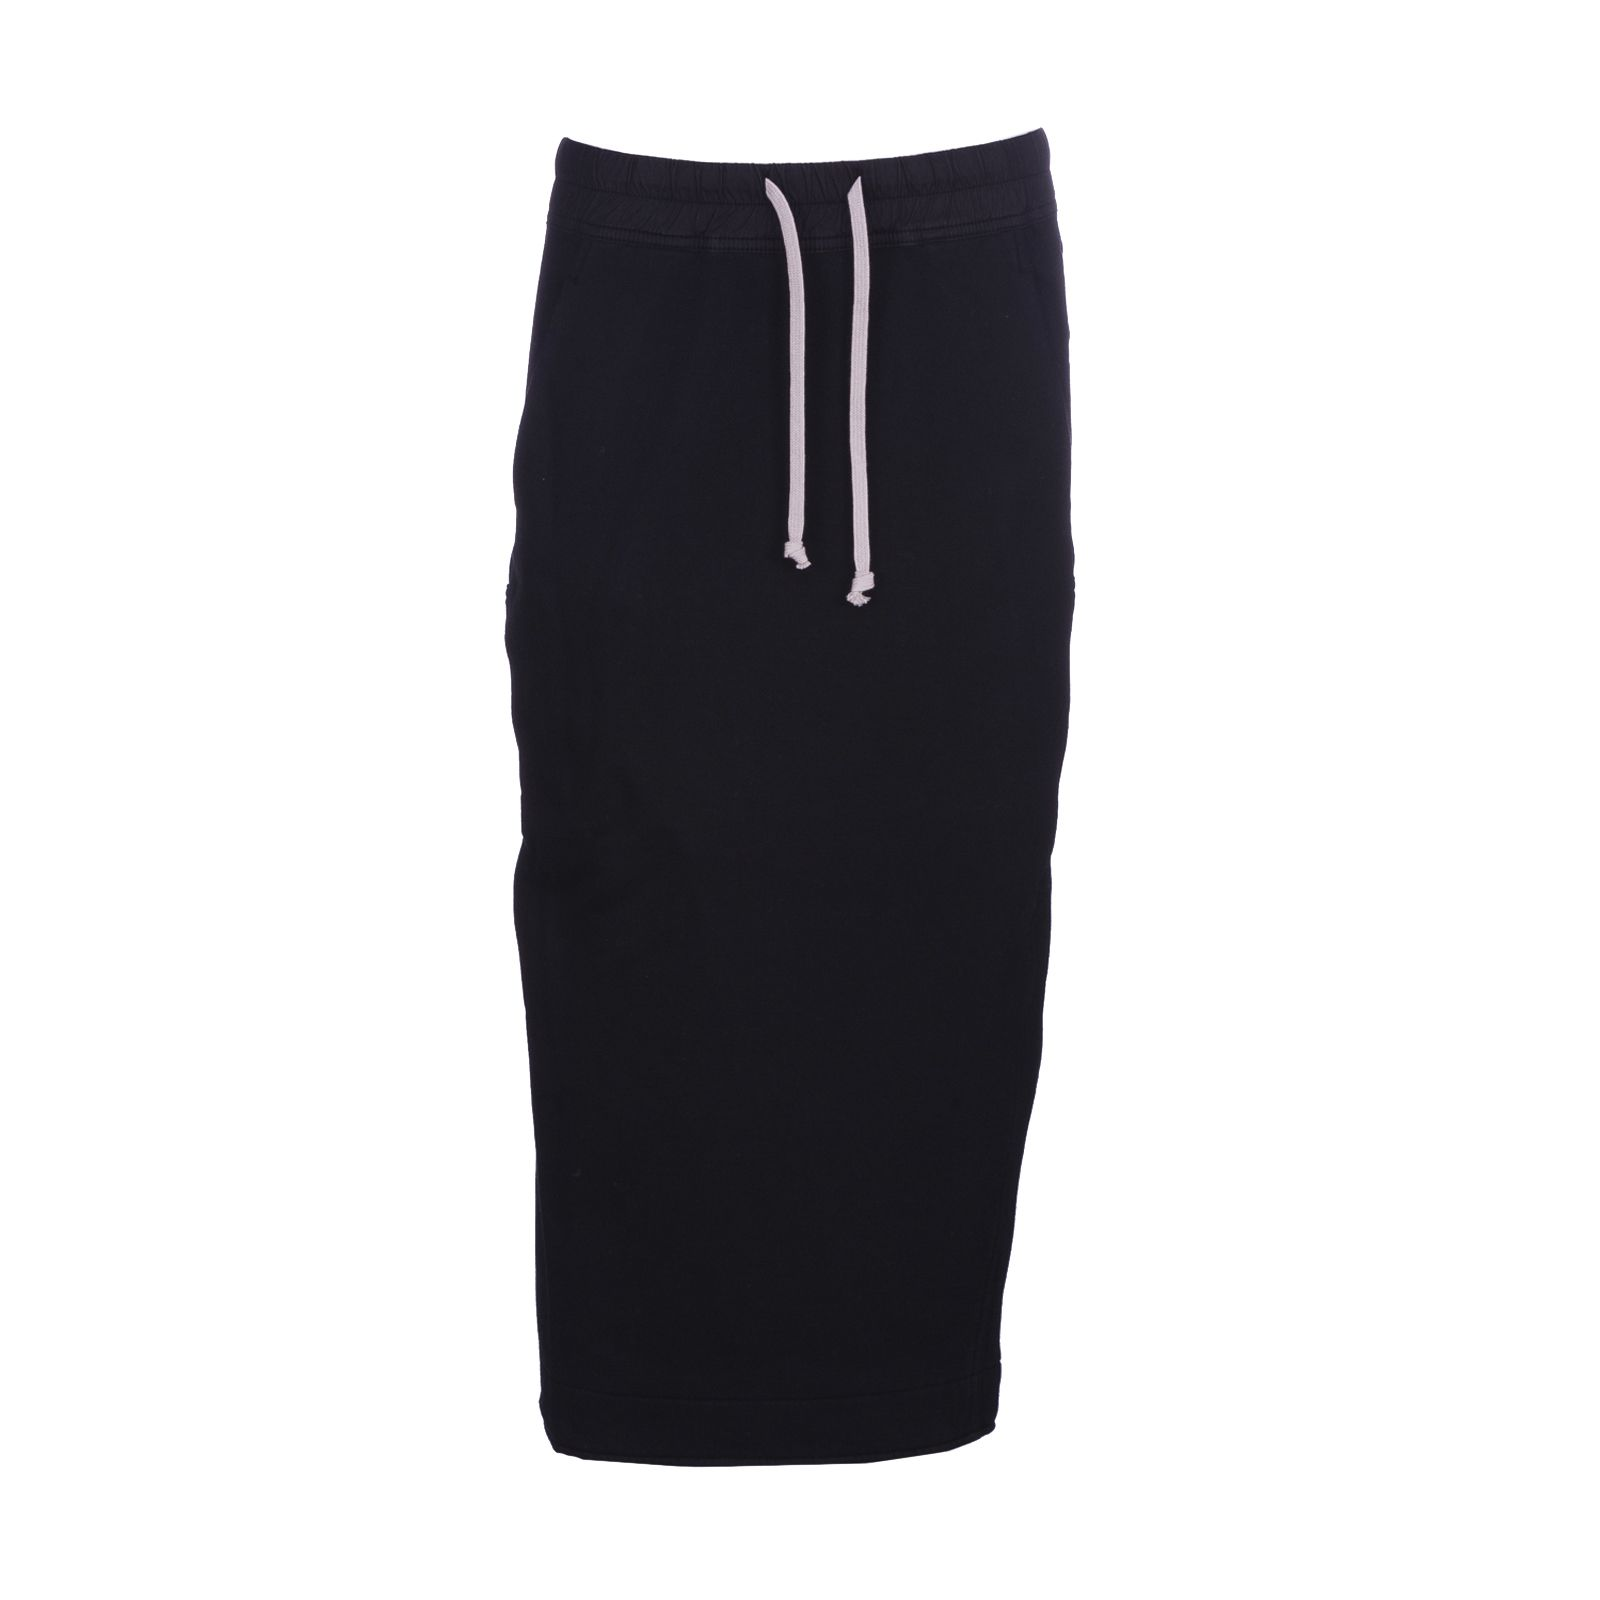 Rick Owens Drkshdw Elasticated Waist Skirt